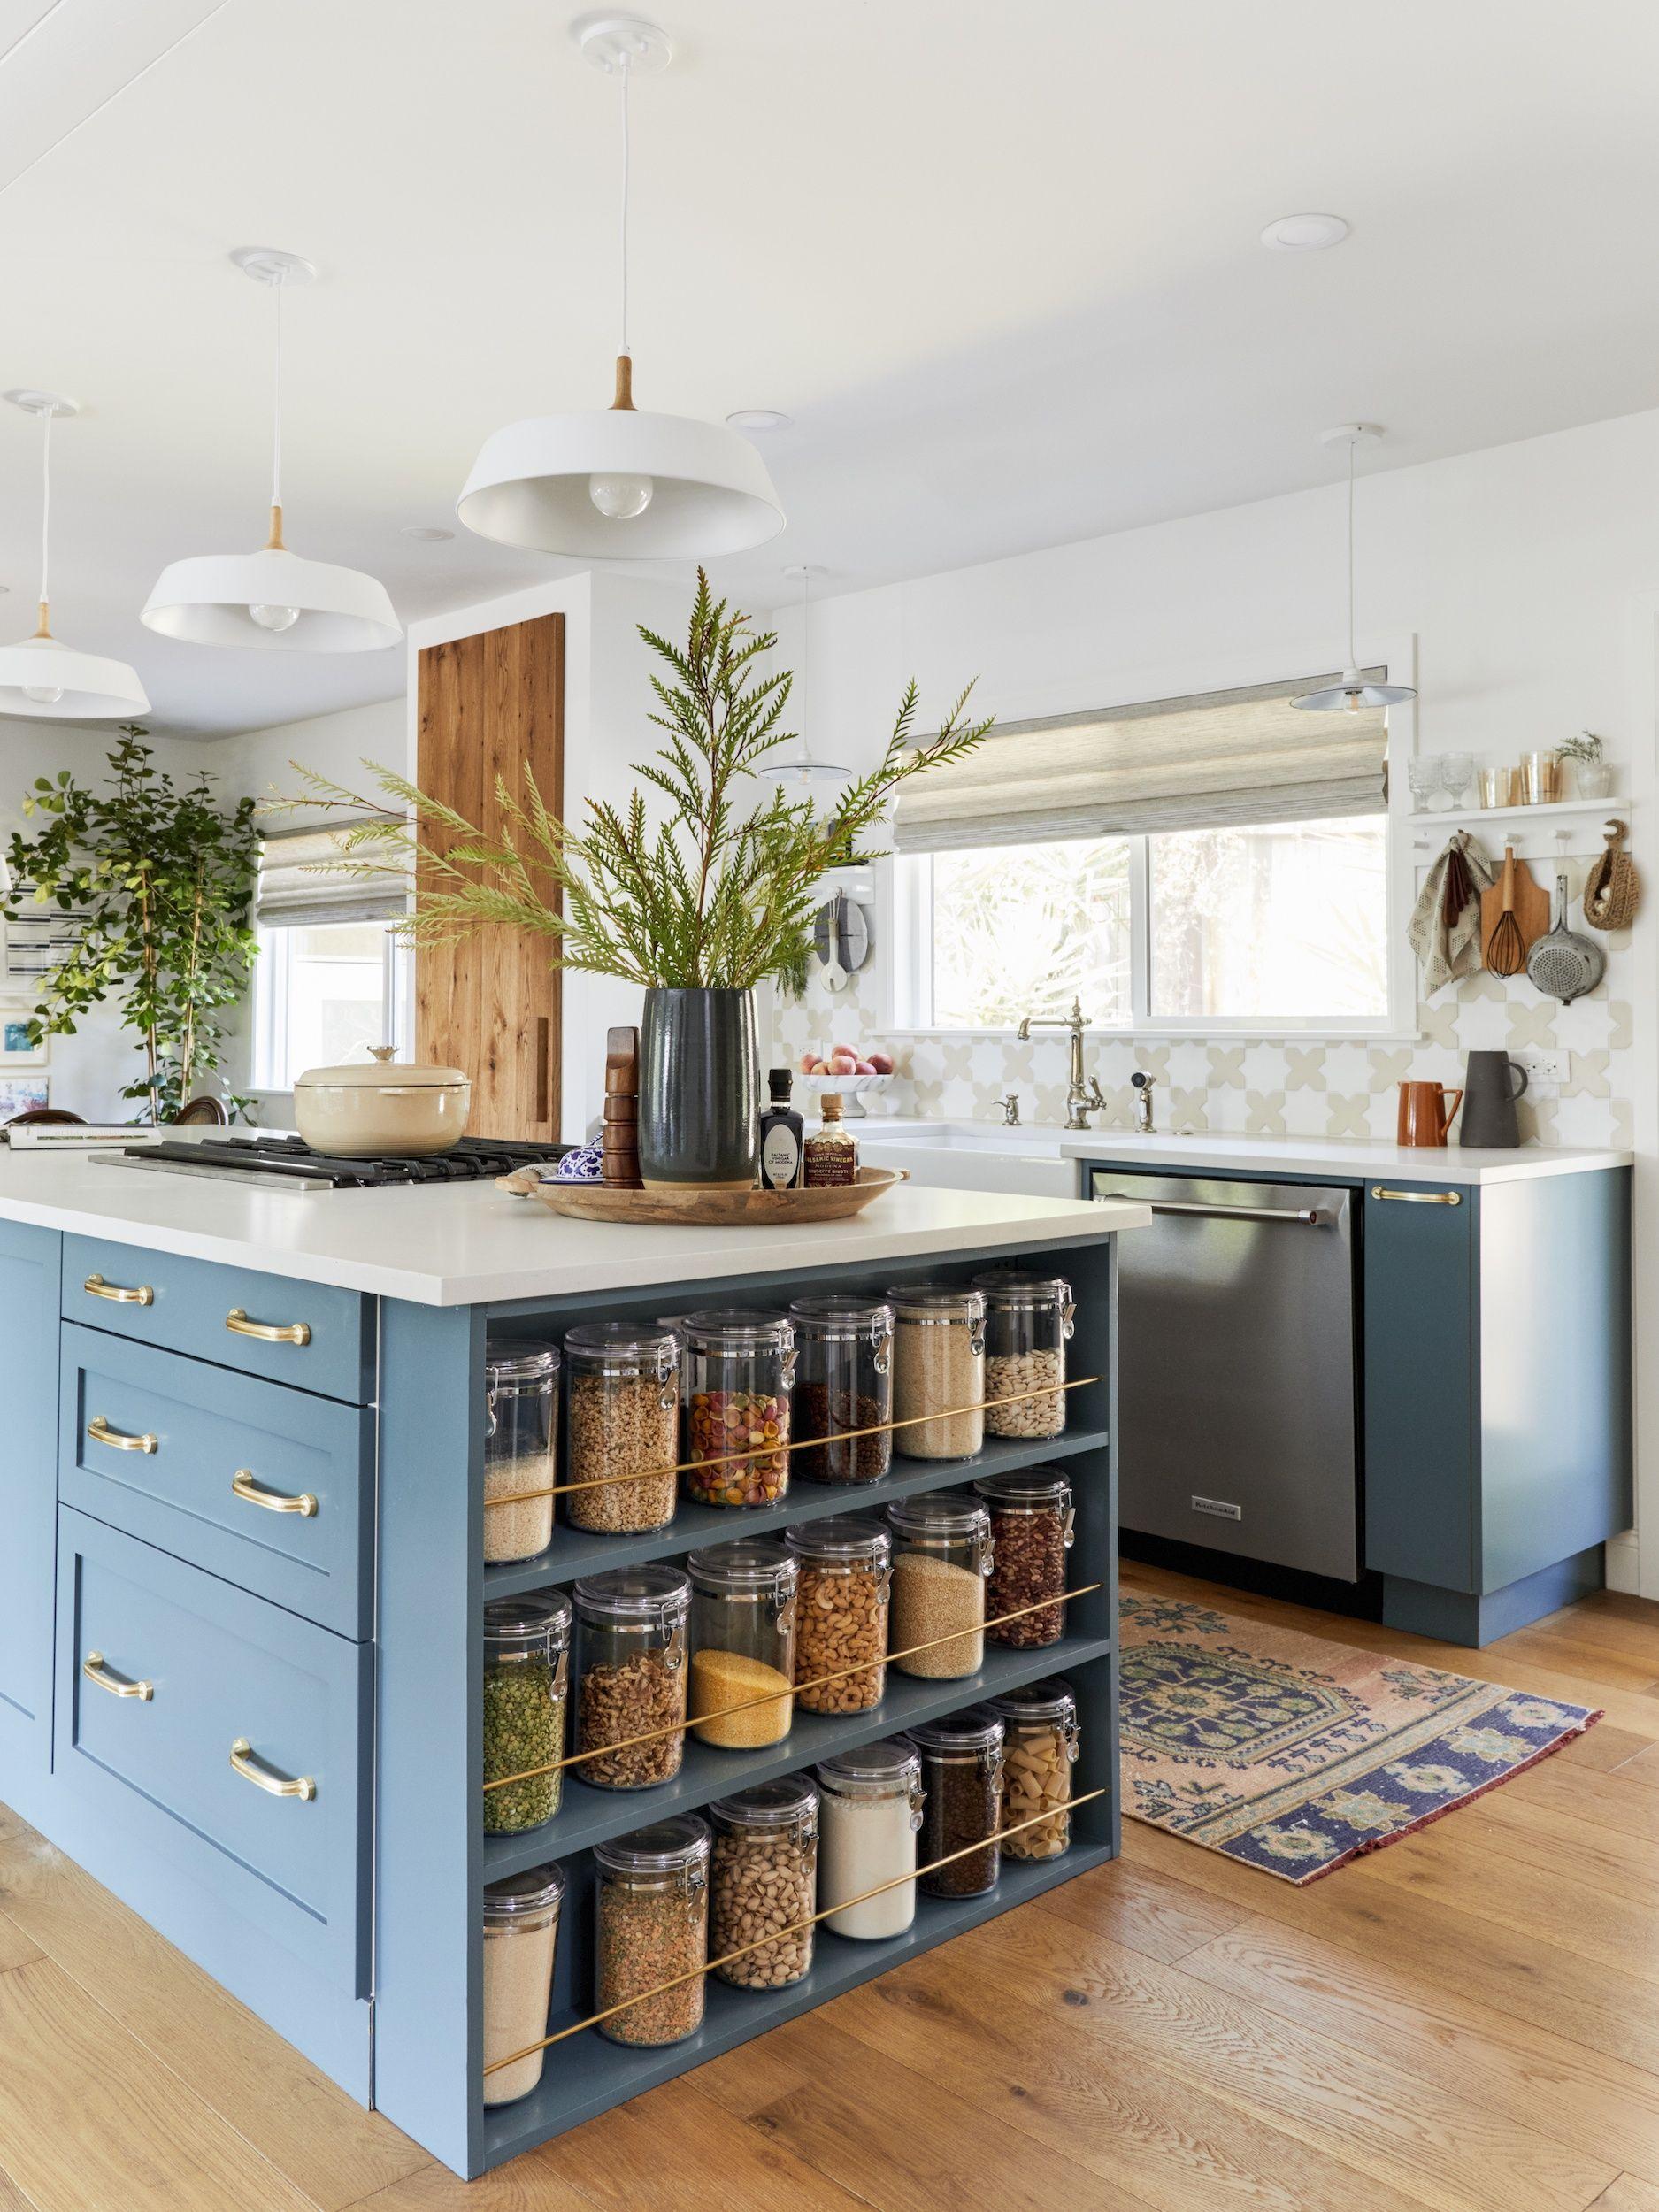 5 Kitchen Island Storage Ideas That Maximize Every Inch